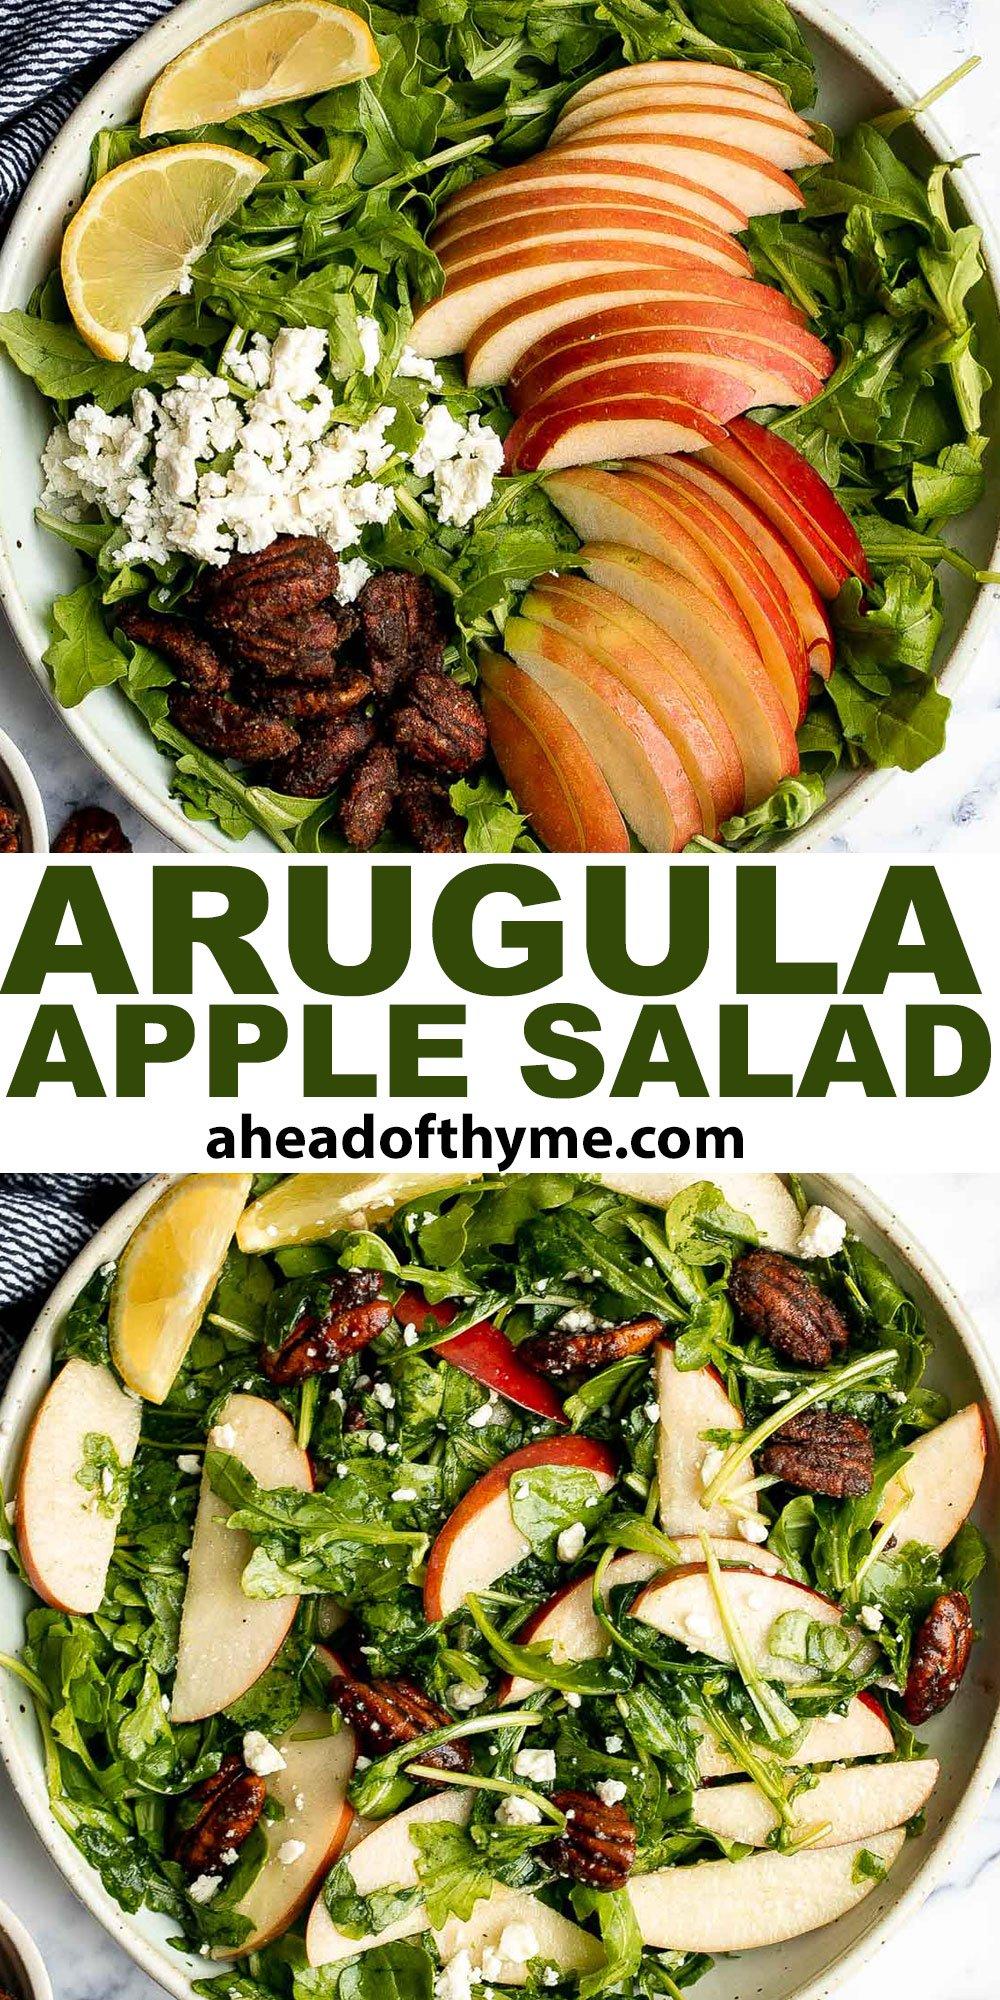 Arugula Salad with Apple and Pecan